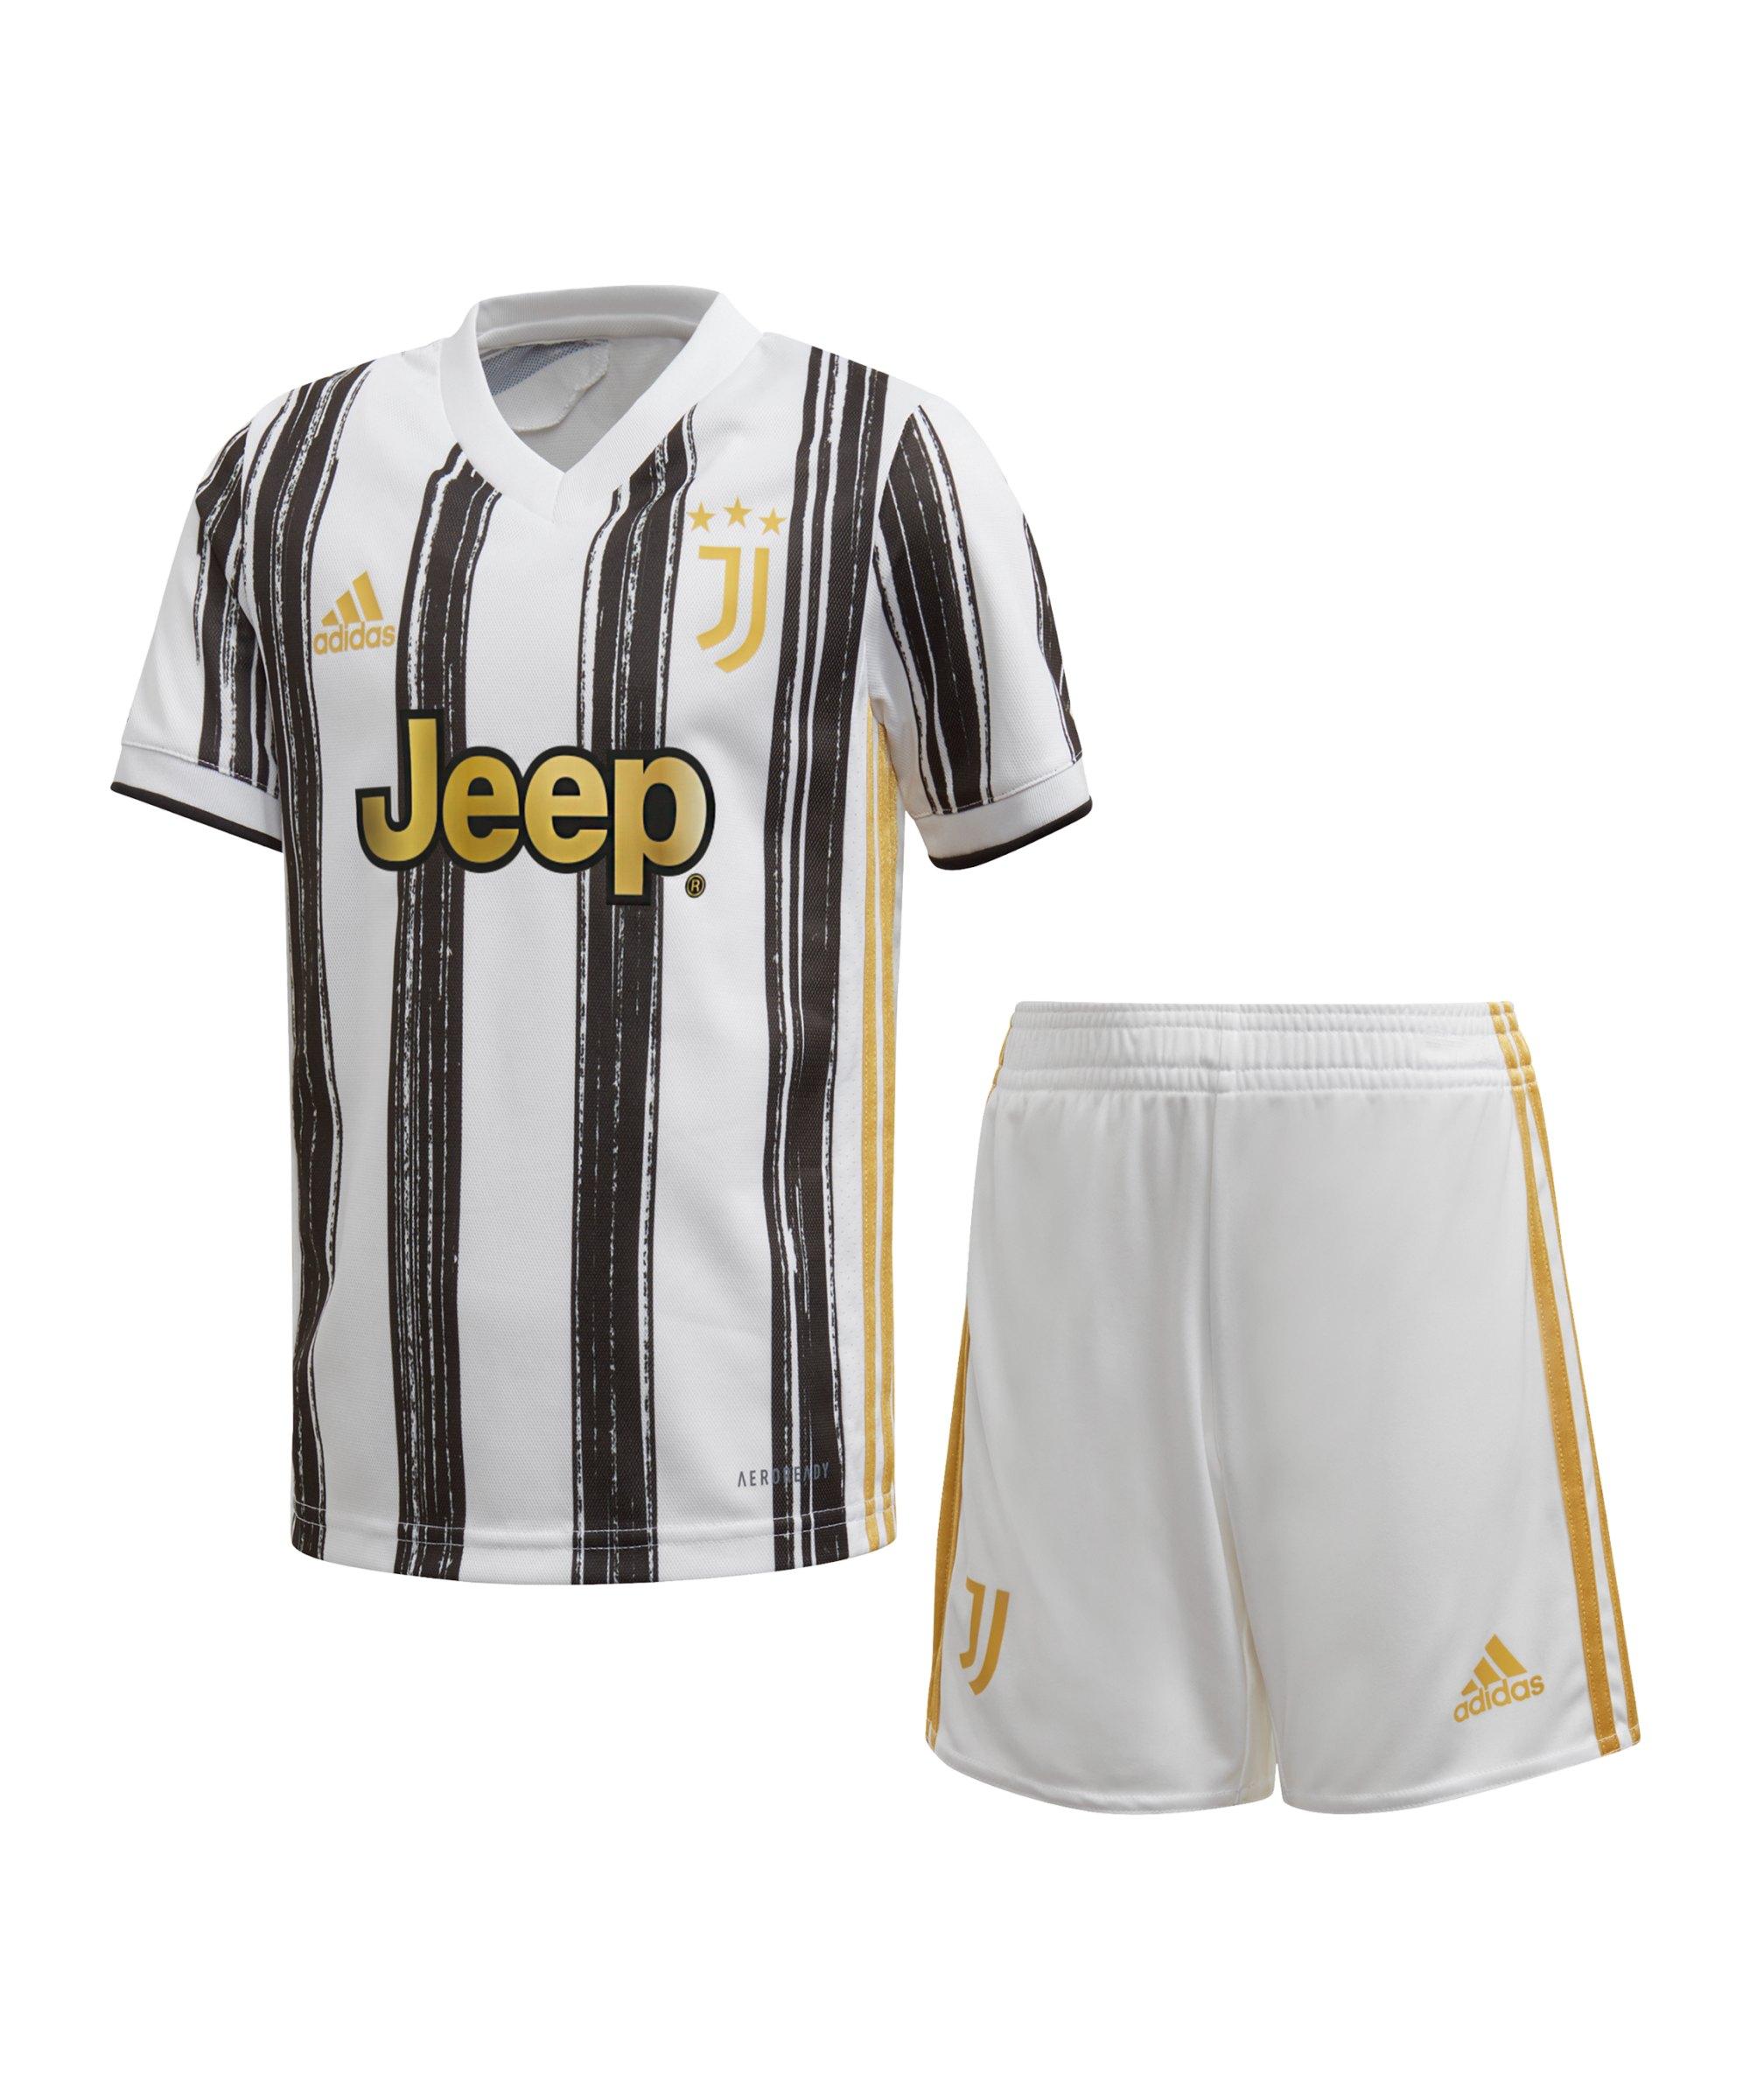 adidas Juventus Turin Minikit Home 2020/2021 Weiss - weiss